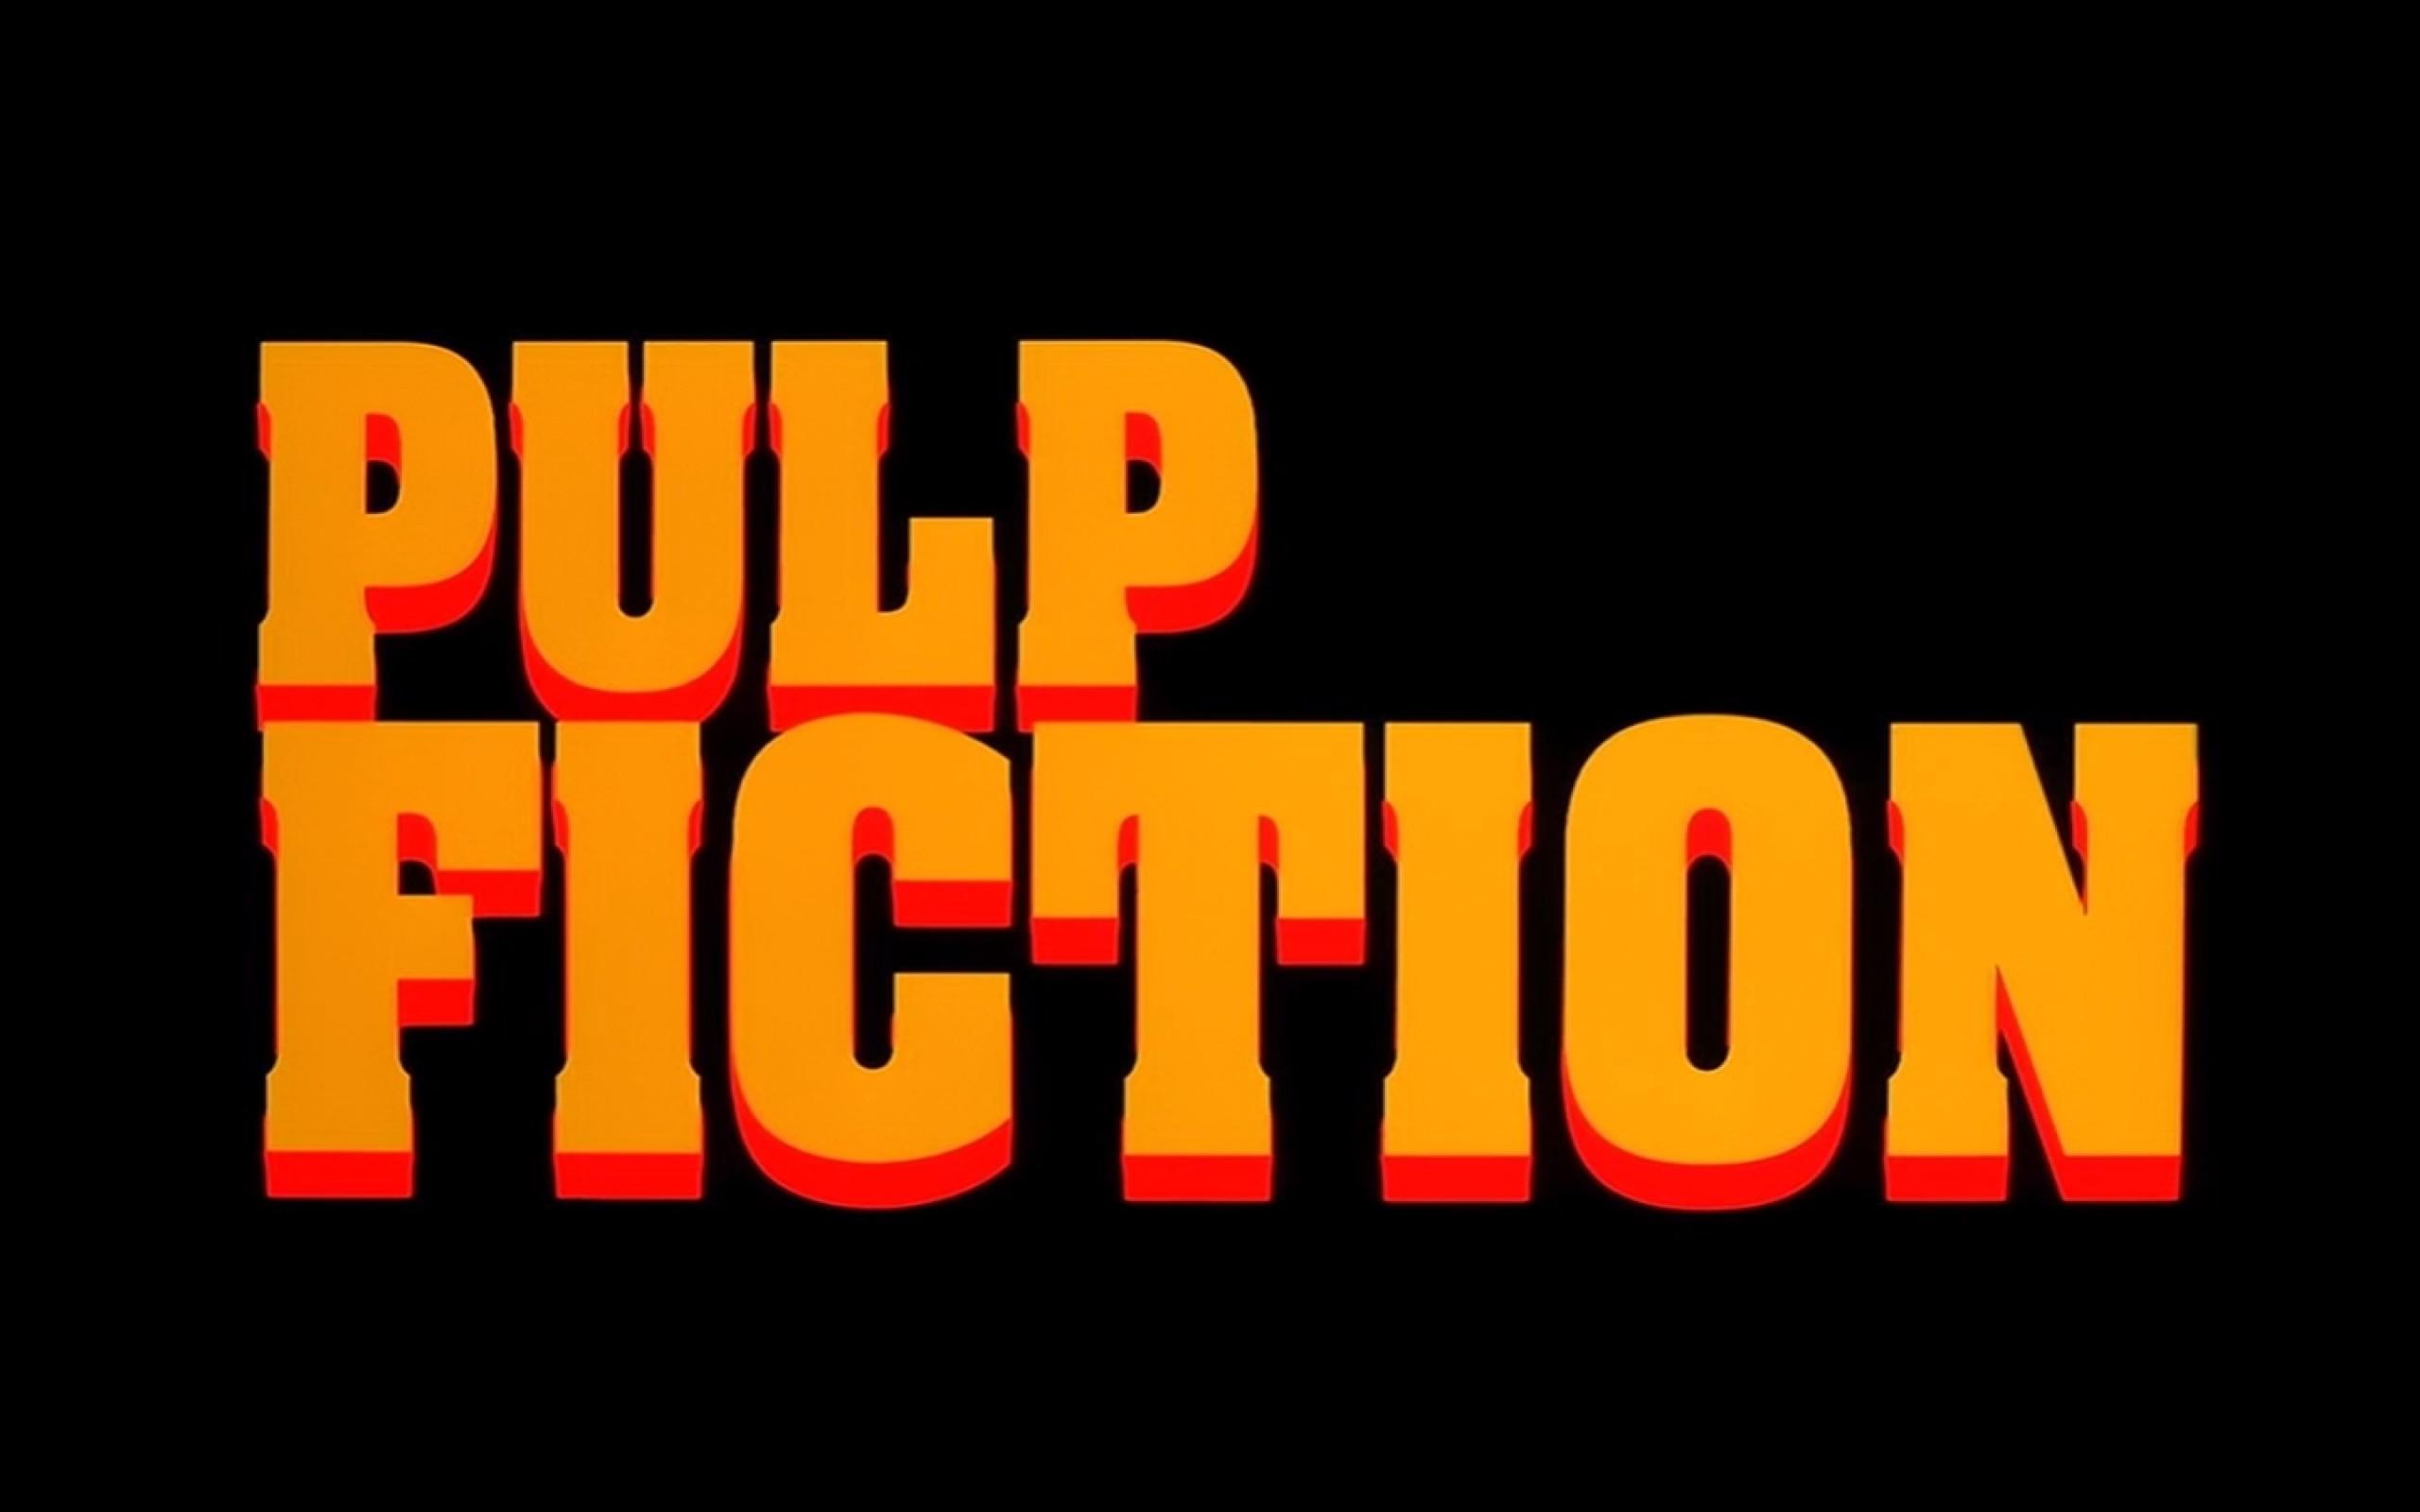 Pulp Fiction Wallpaper Hd 68 Images